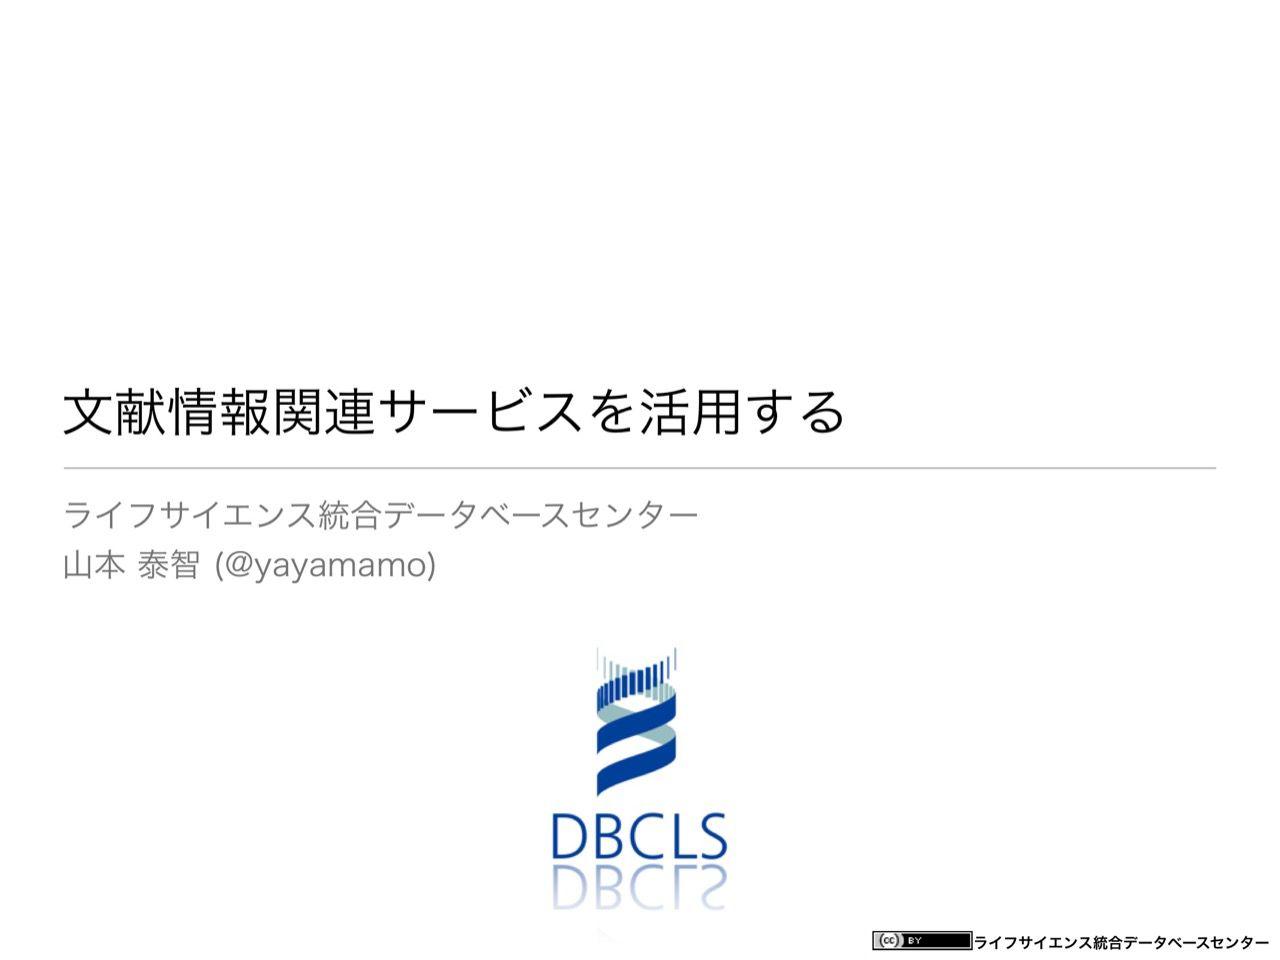 images/AJACS60_yamamoto_001.jpg